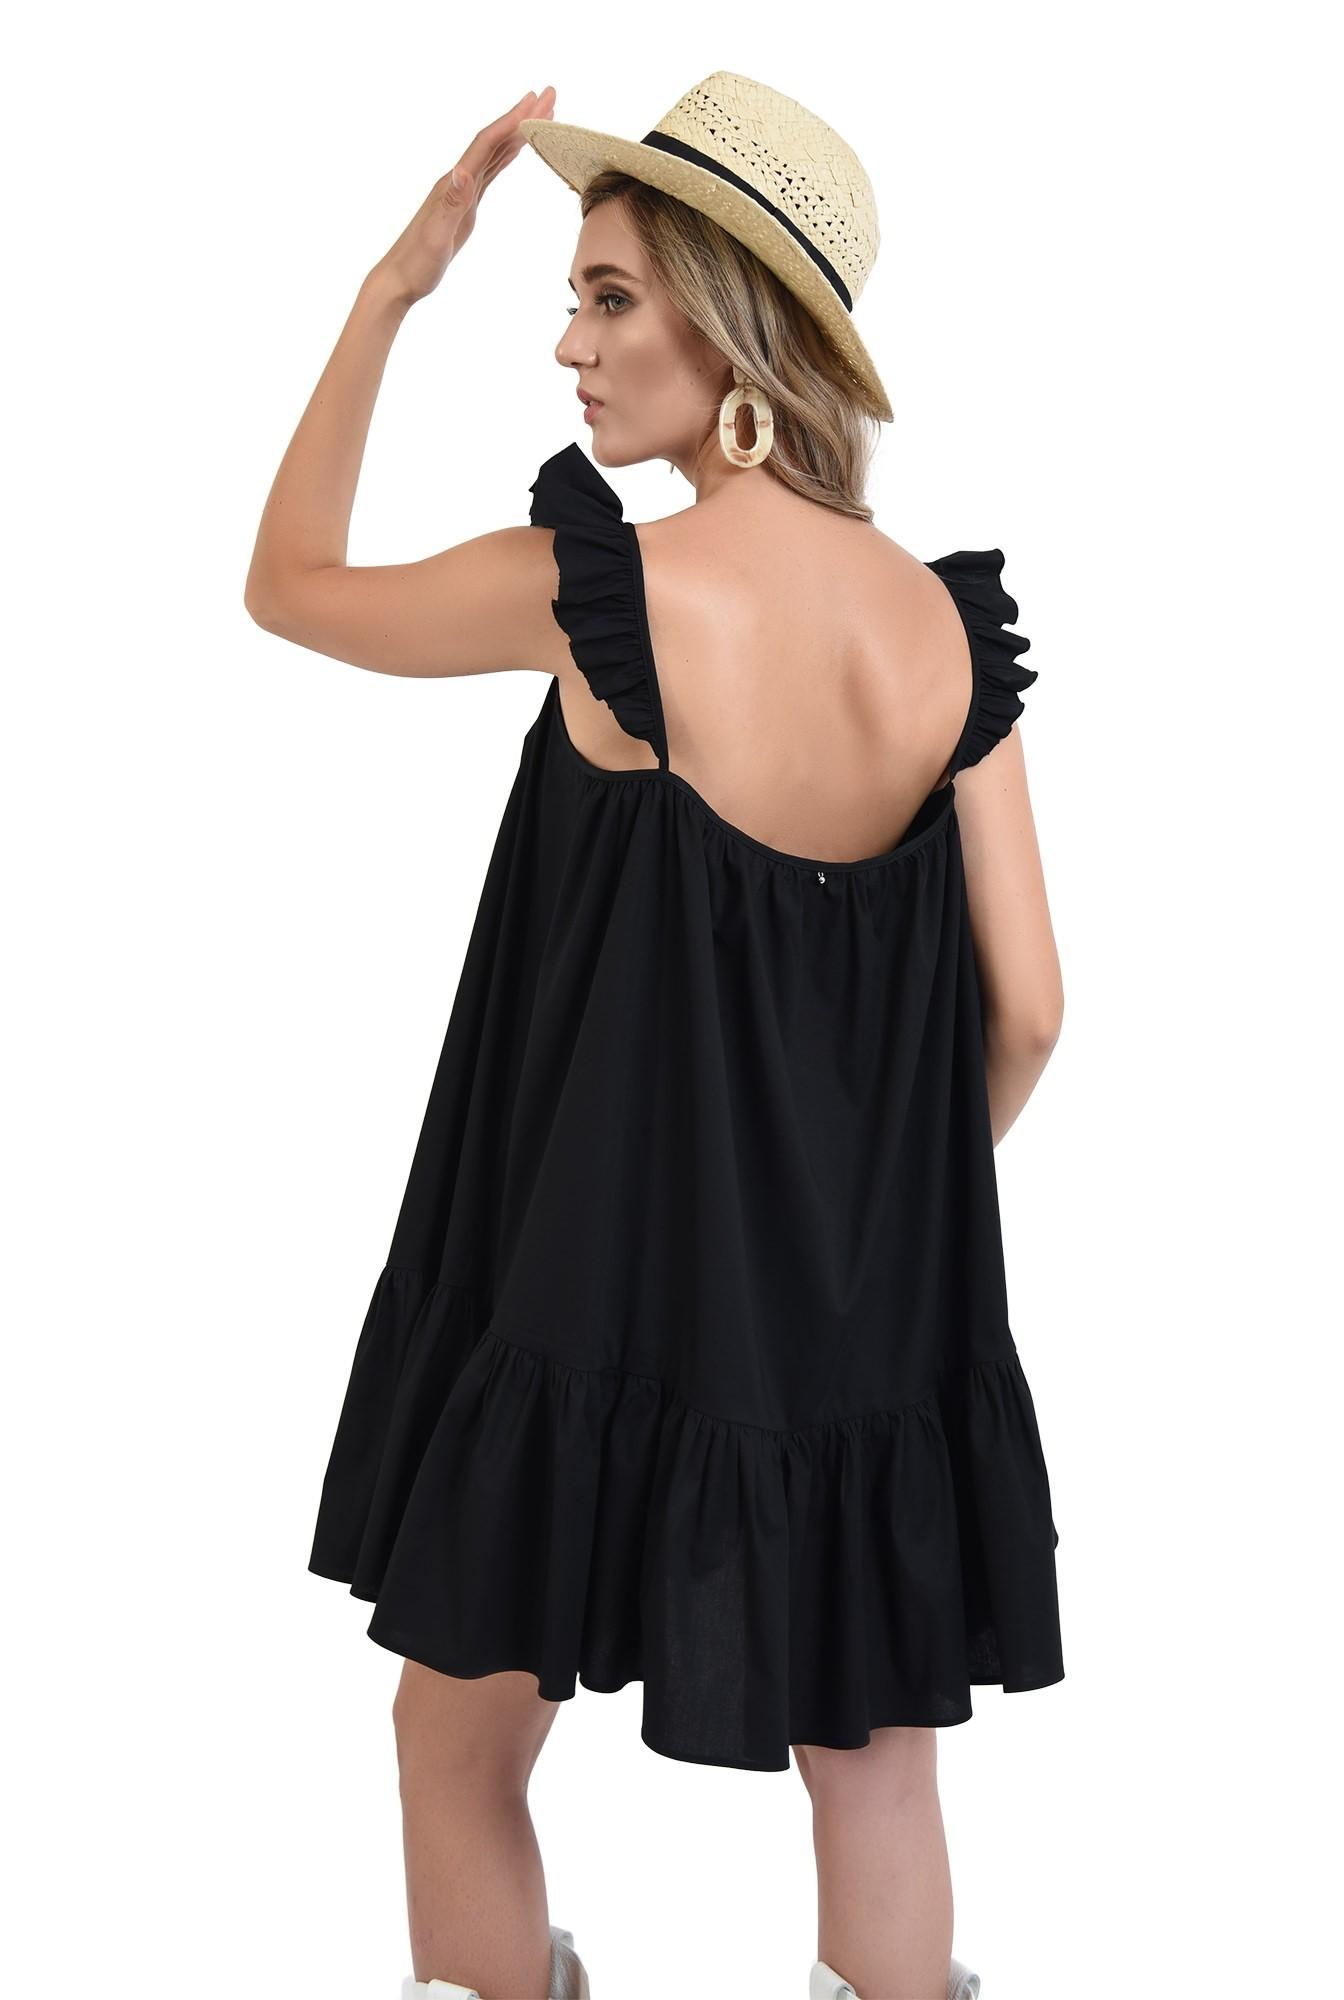 1 - rochie neagra, mini, evazata, cu volan la baza, cu bretele, bumbac